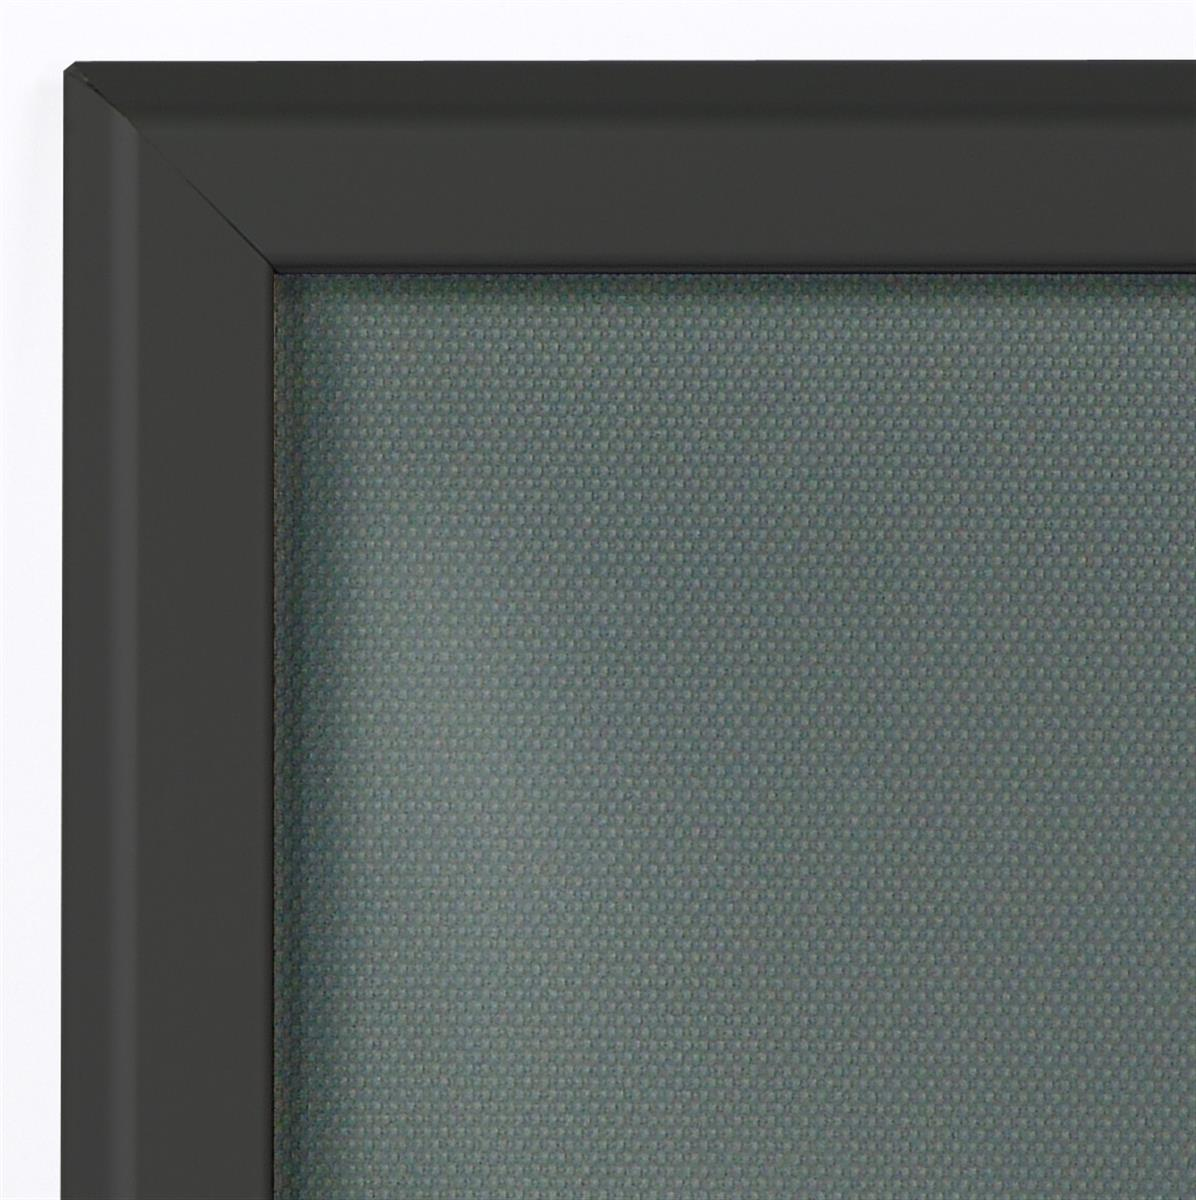 Quick Clip Poster Frames in Black Fit 18 x 24 Prints